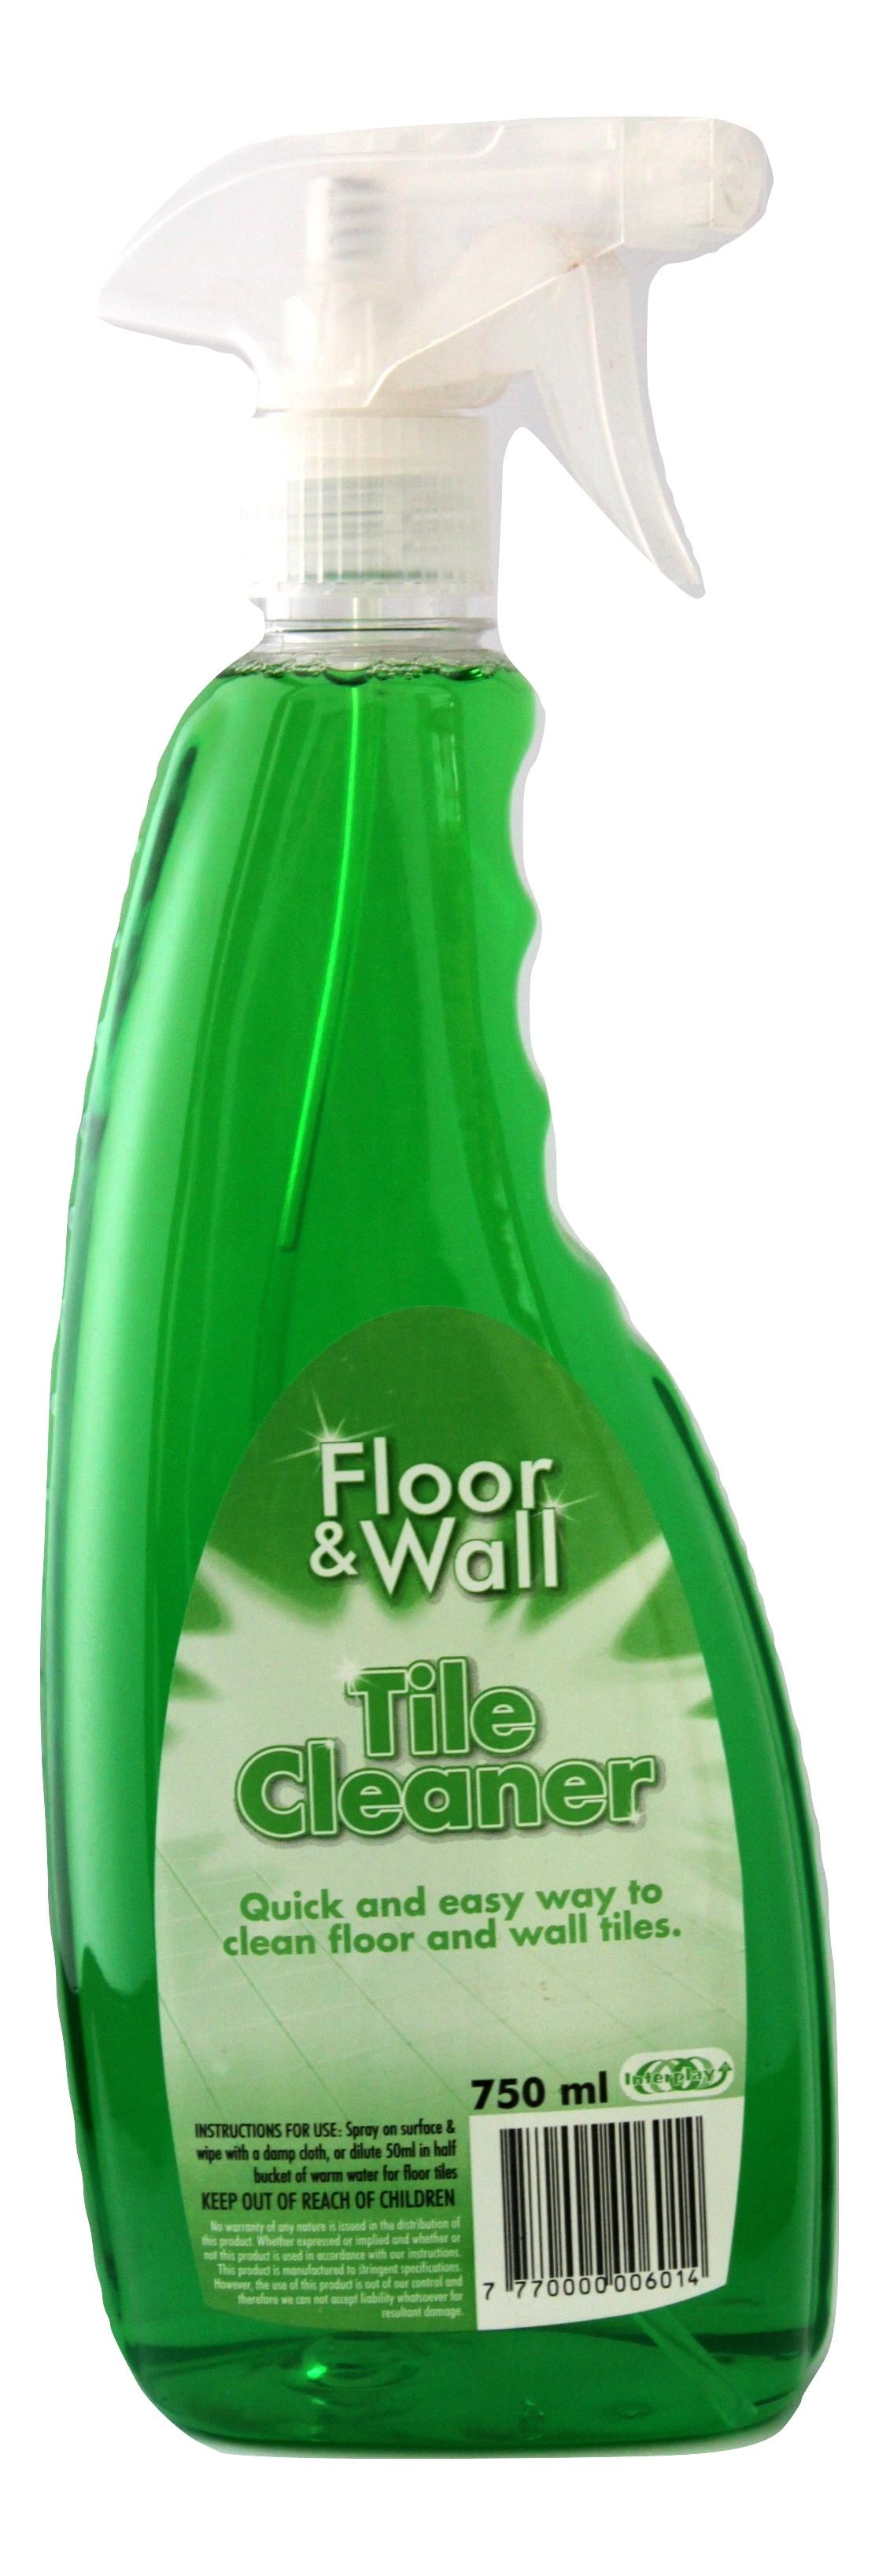 floor-wall-&amp-tile-cleaner